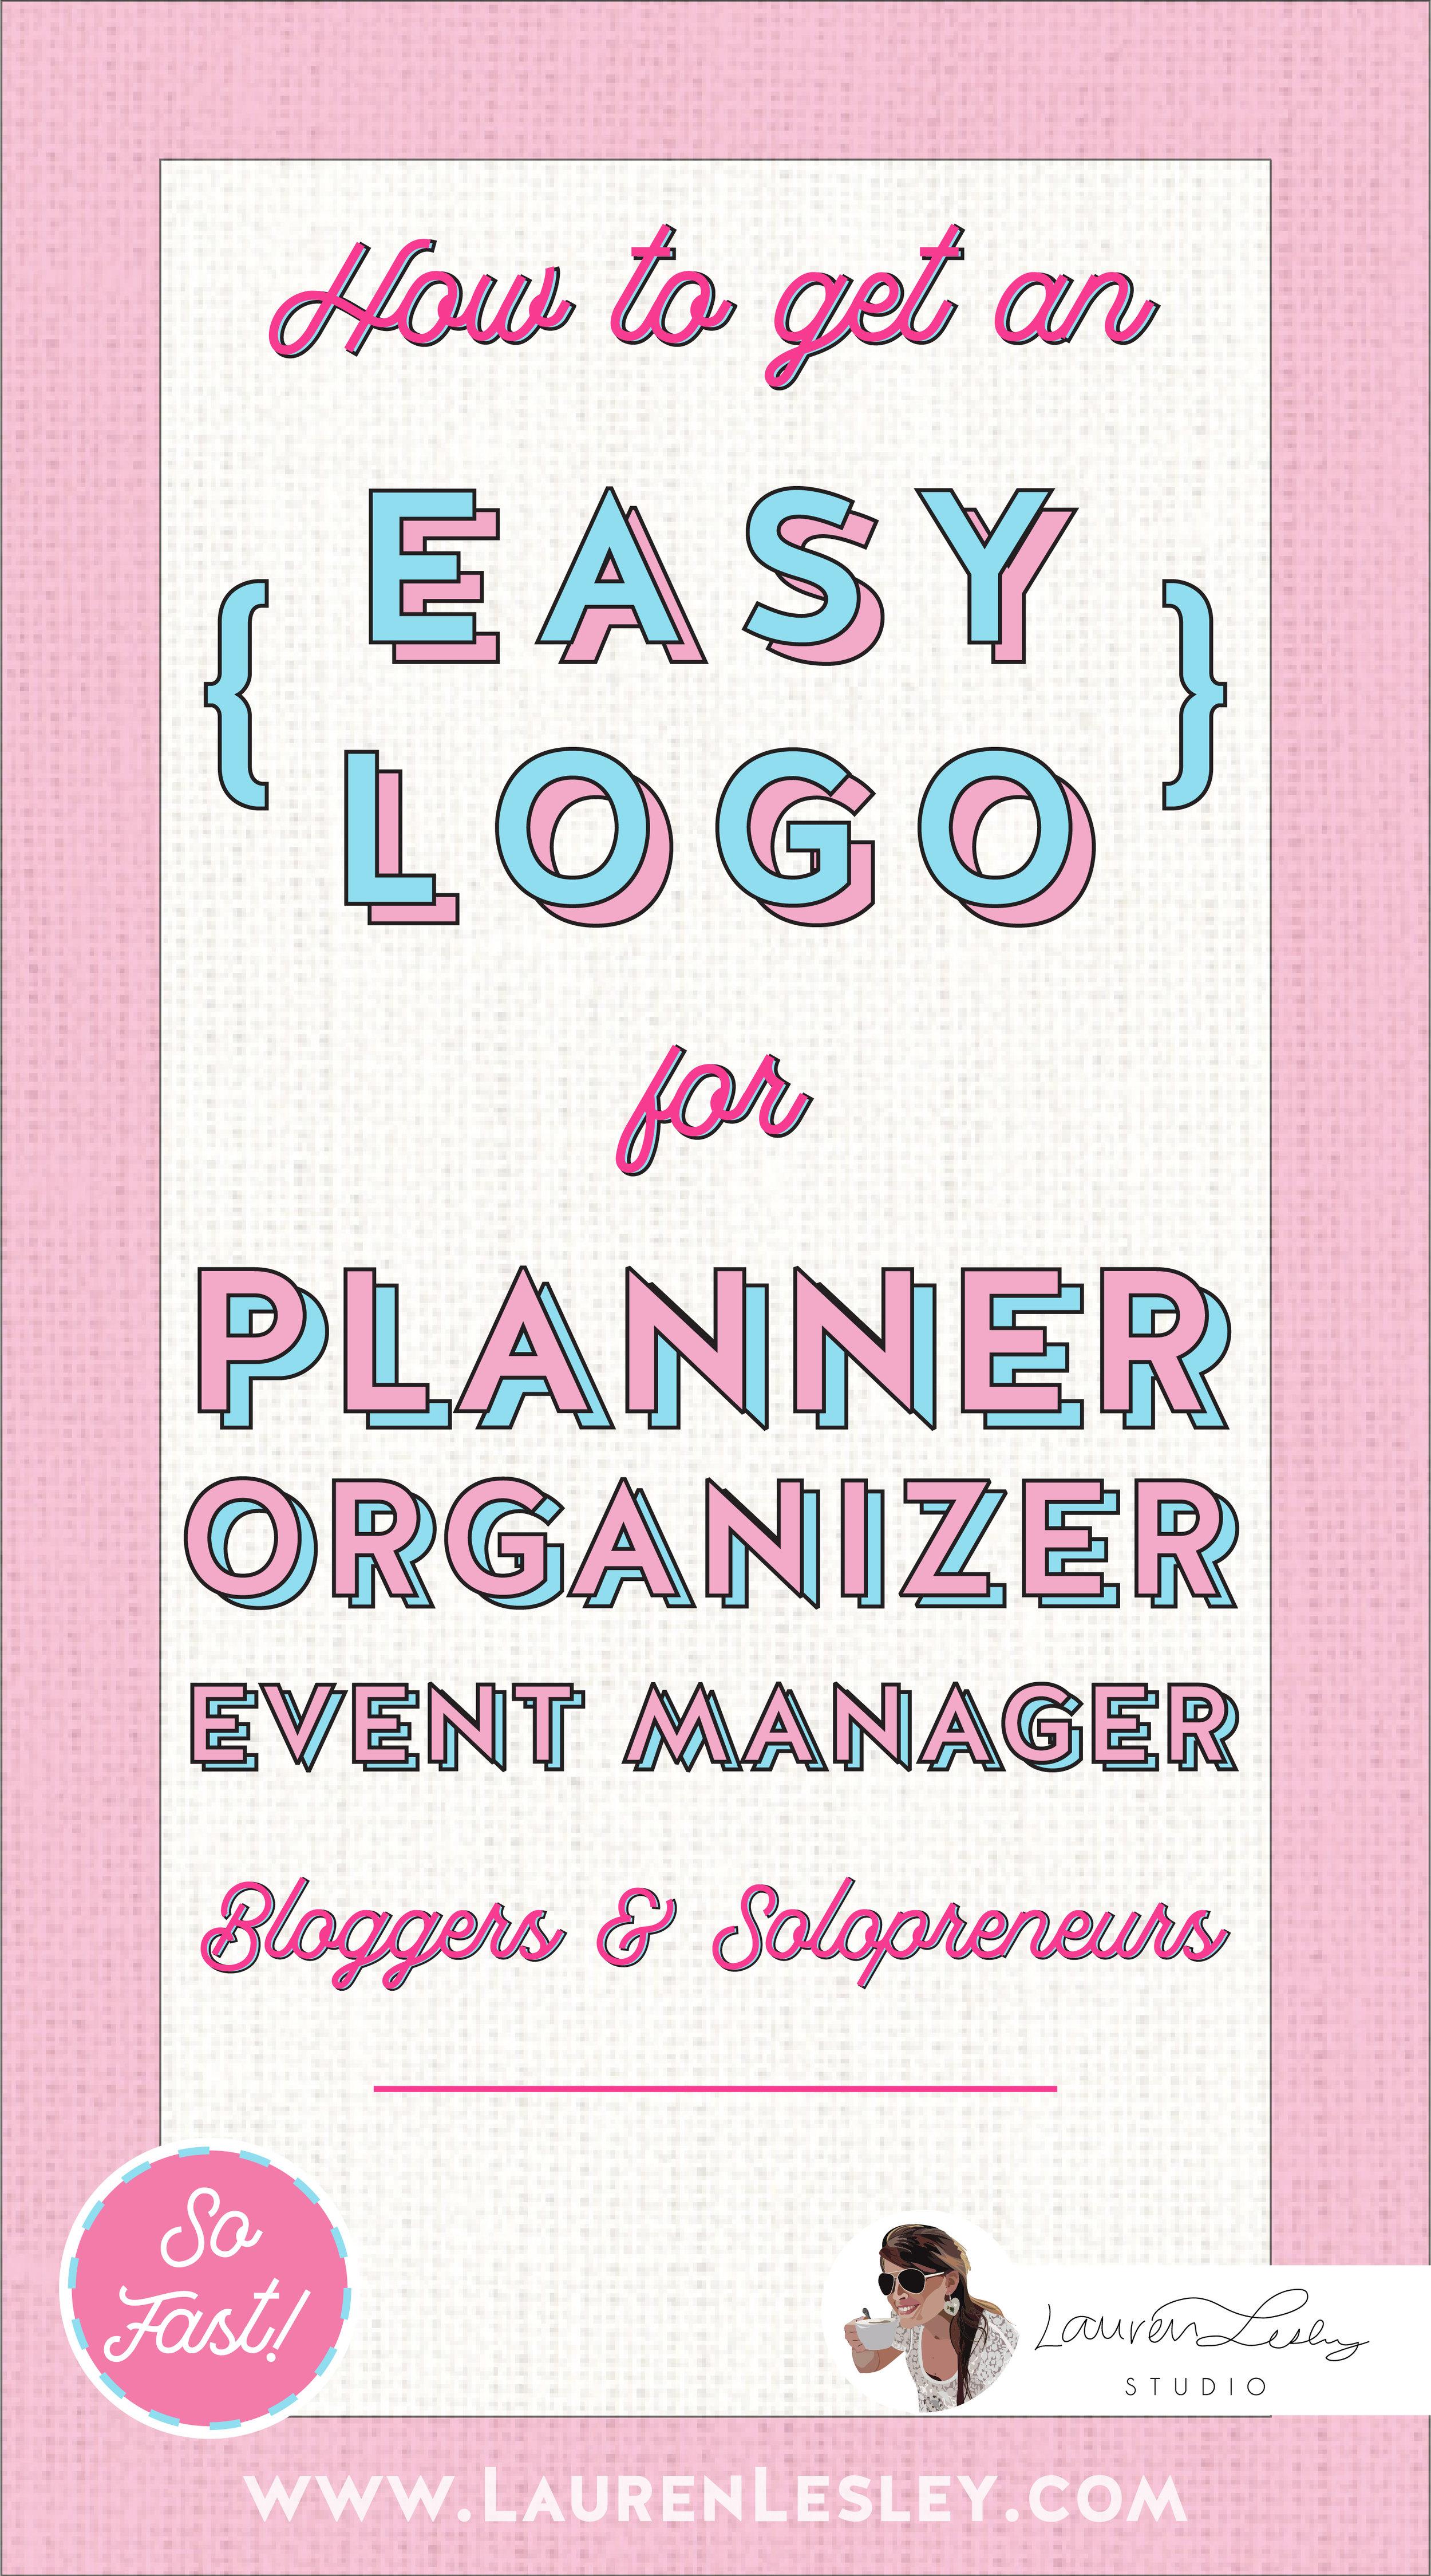 Pinterest_Planner_Organizer_Event-Manager-01.jpg